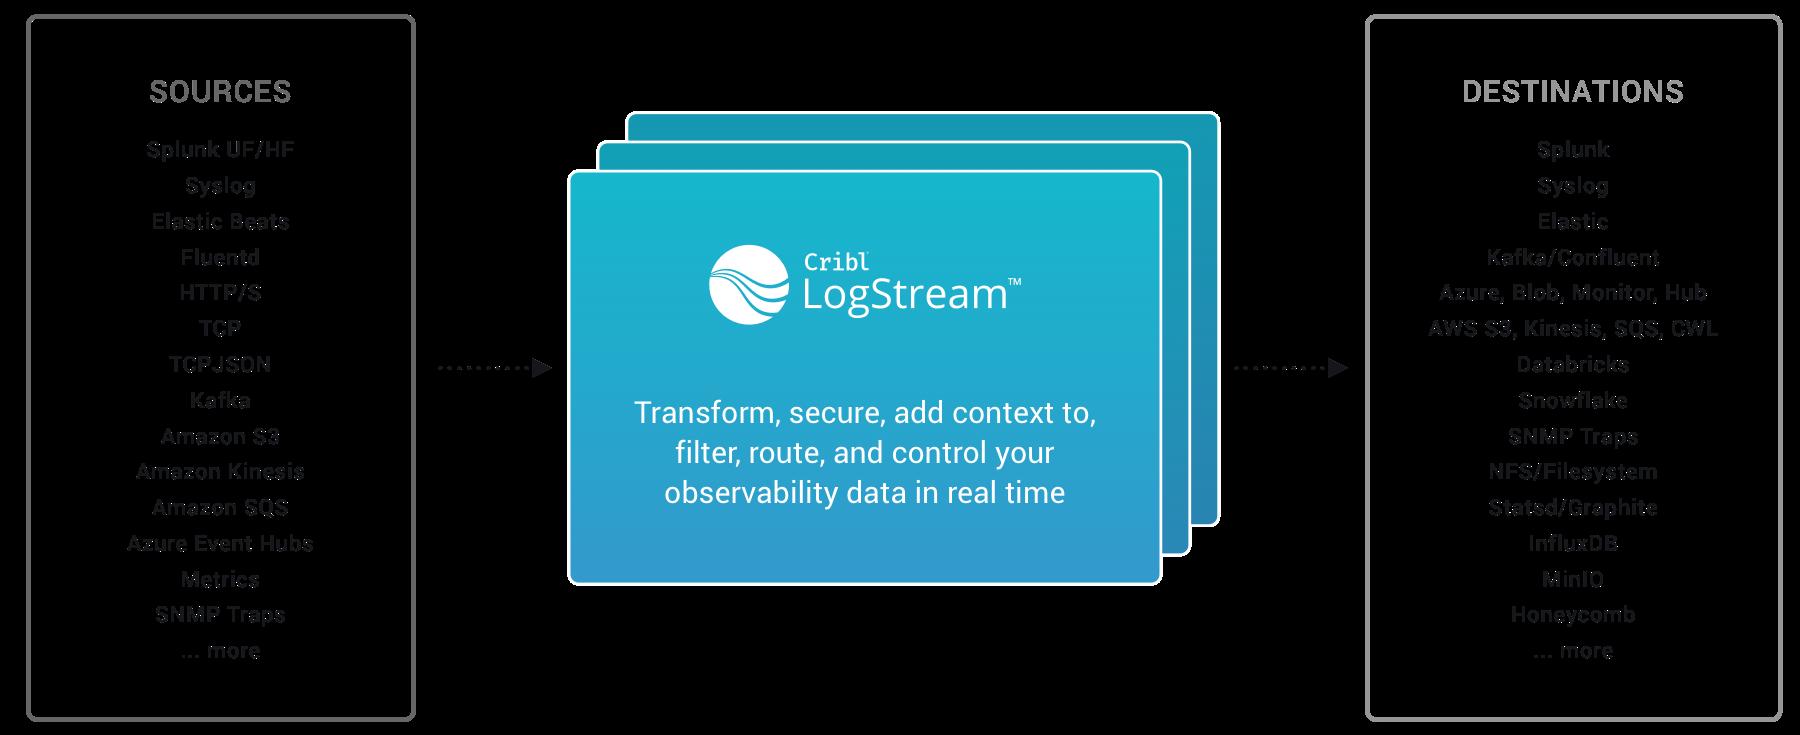 Sources, LogStream, destinations